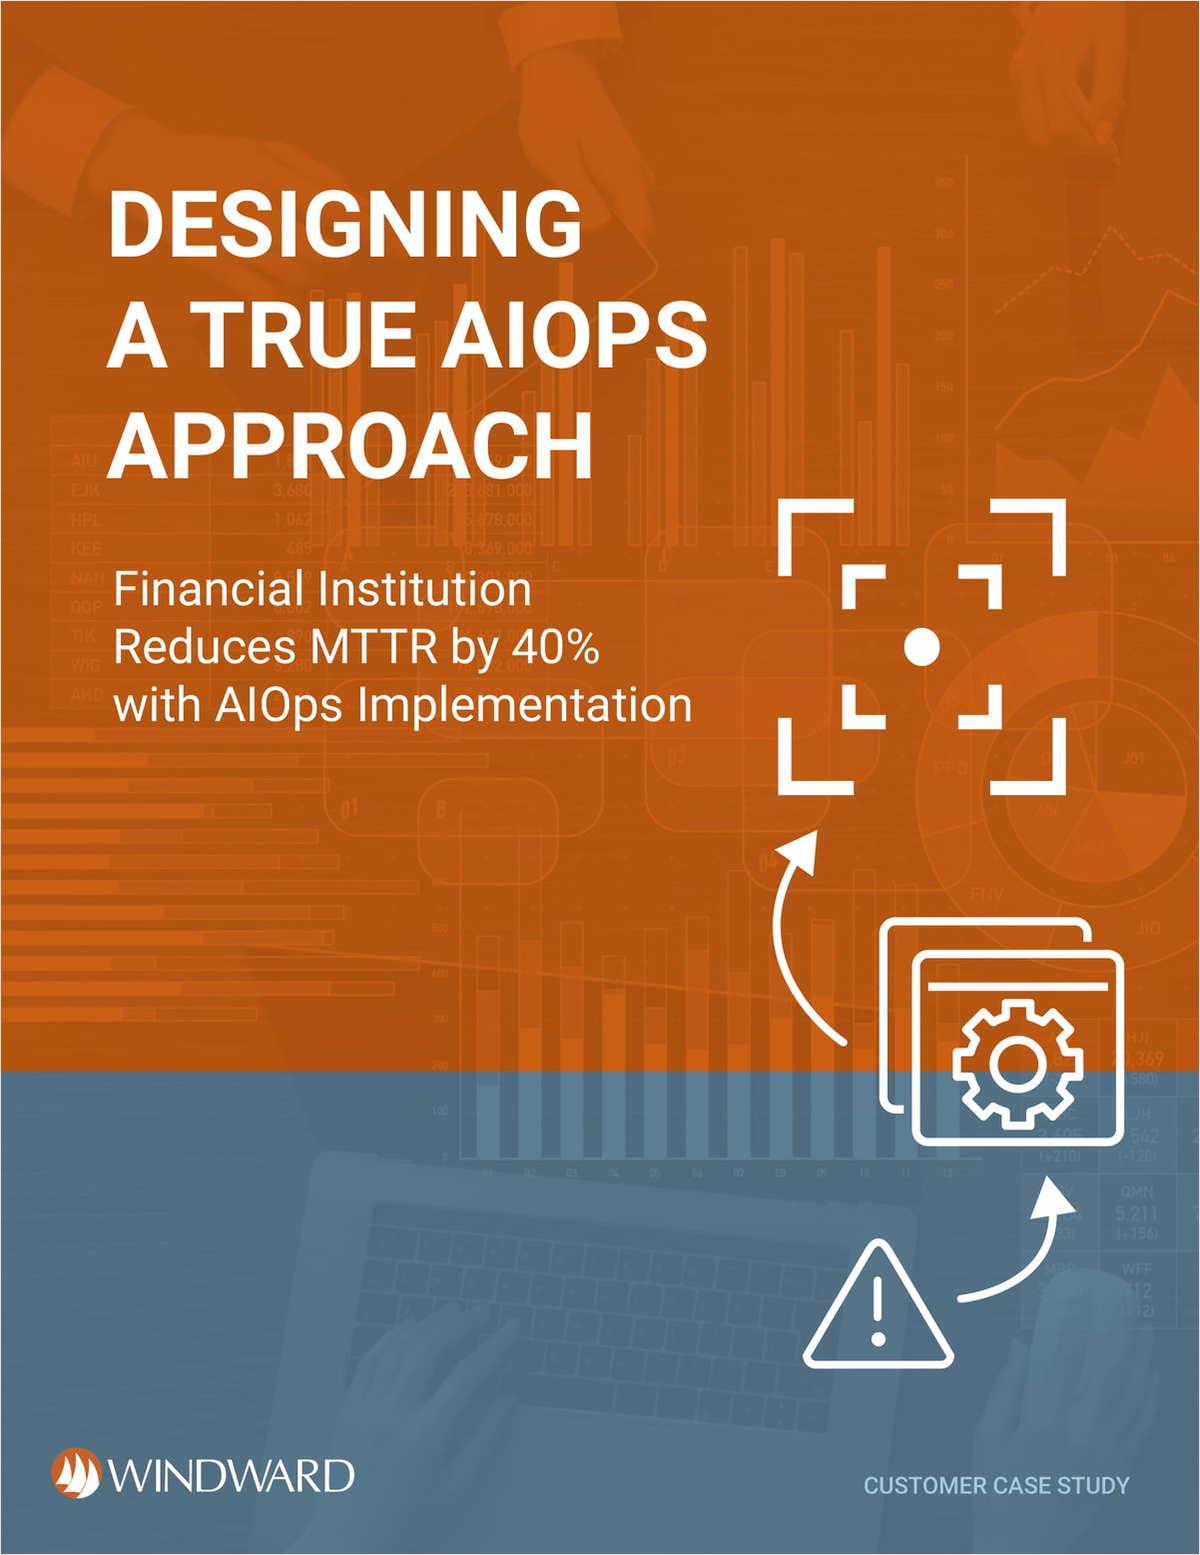 Designing A True AIOpS Approach